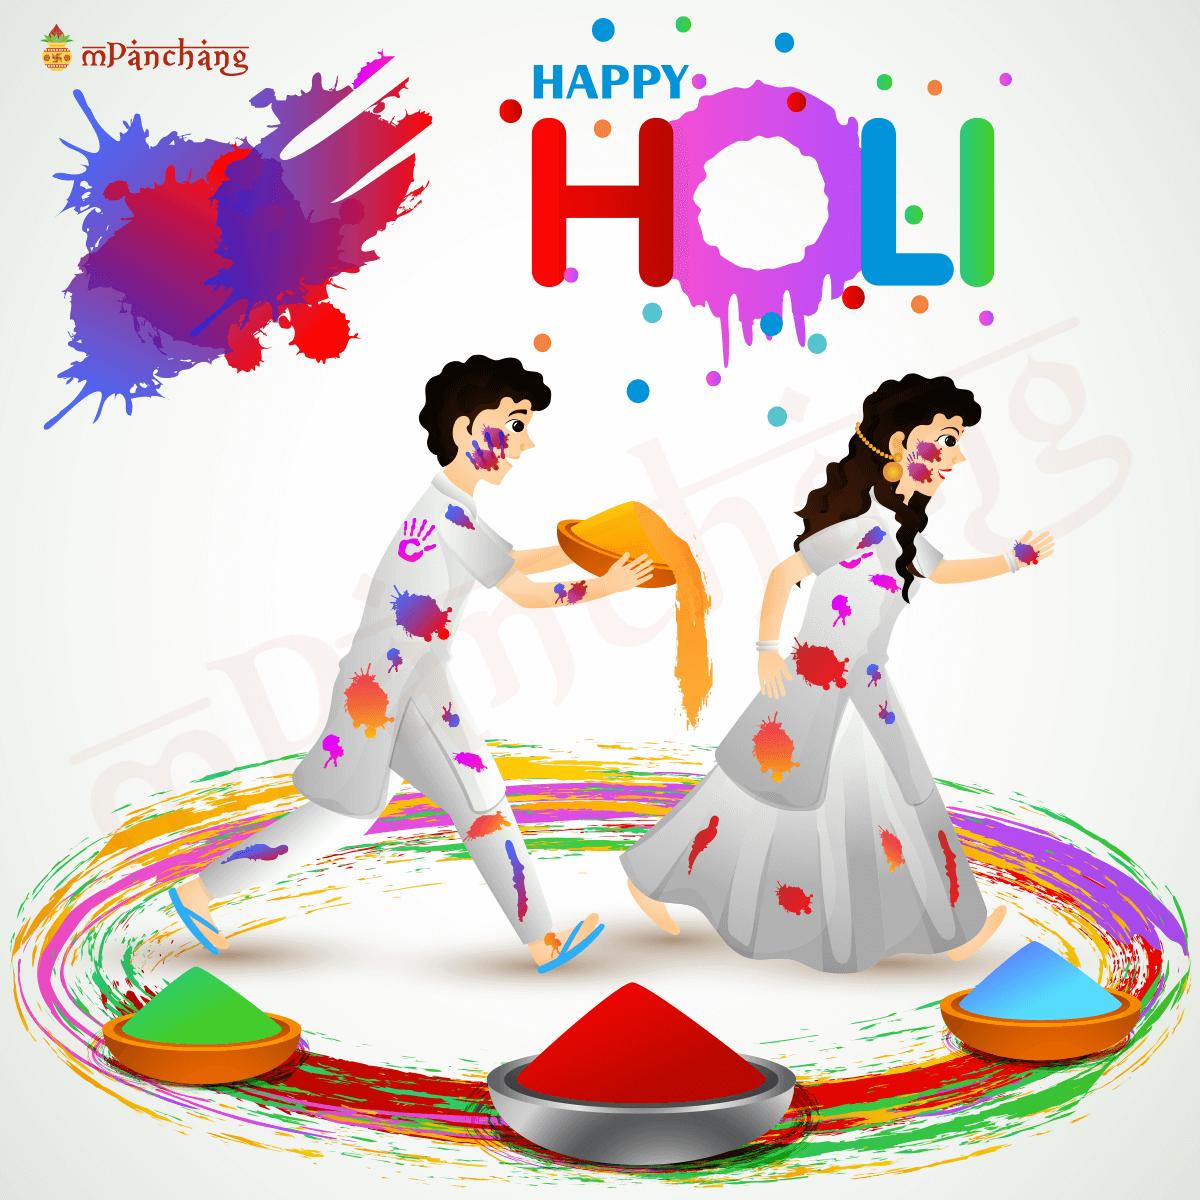 Get Trending Happy Holi Festival 2020  Wishes. Follow My Board to Get many holi status. #happyholi #holi2020 #holihai #holistatus #holiwishes #trendingholi #holicolor #holiwishes2020